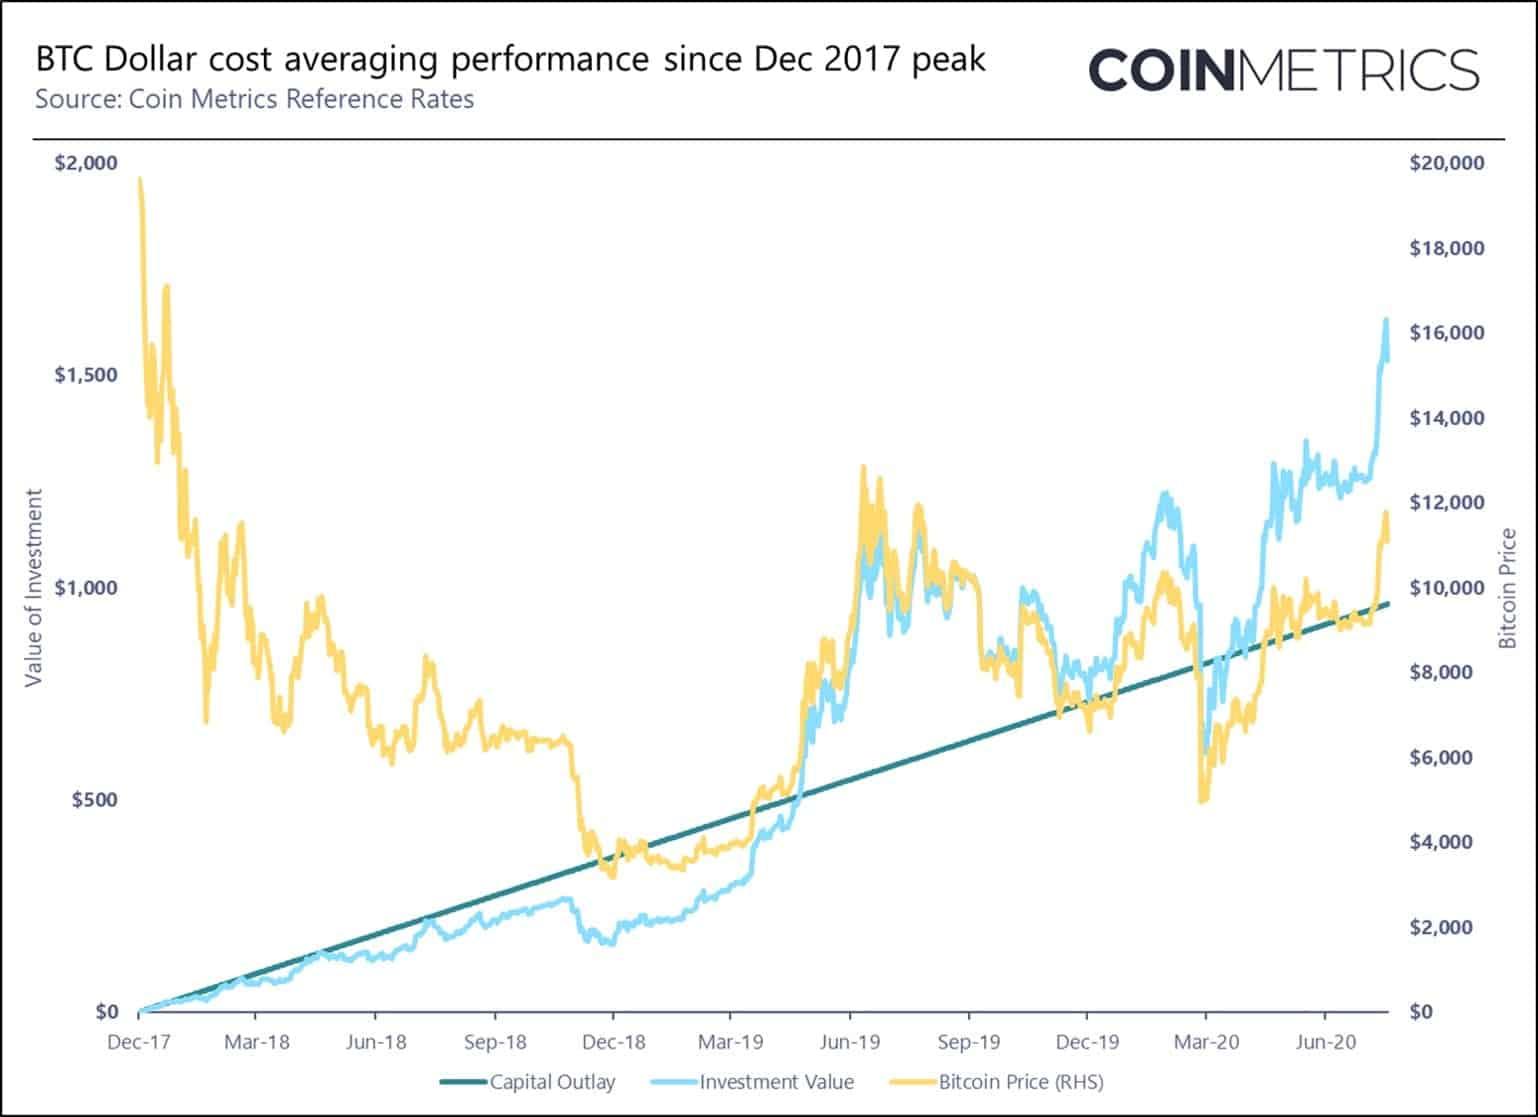 Bitcoin DCA Performance Since 2017. Source: Coinmetrics